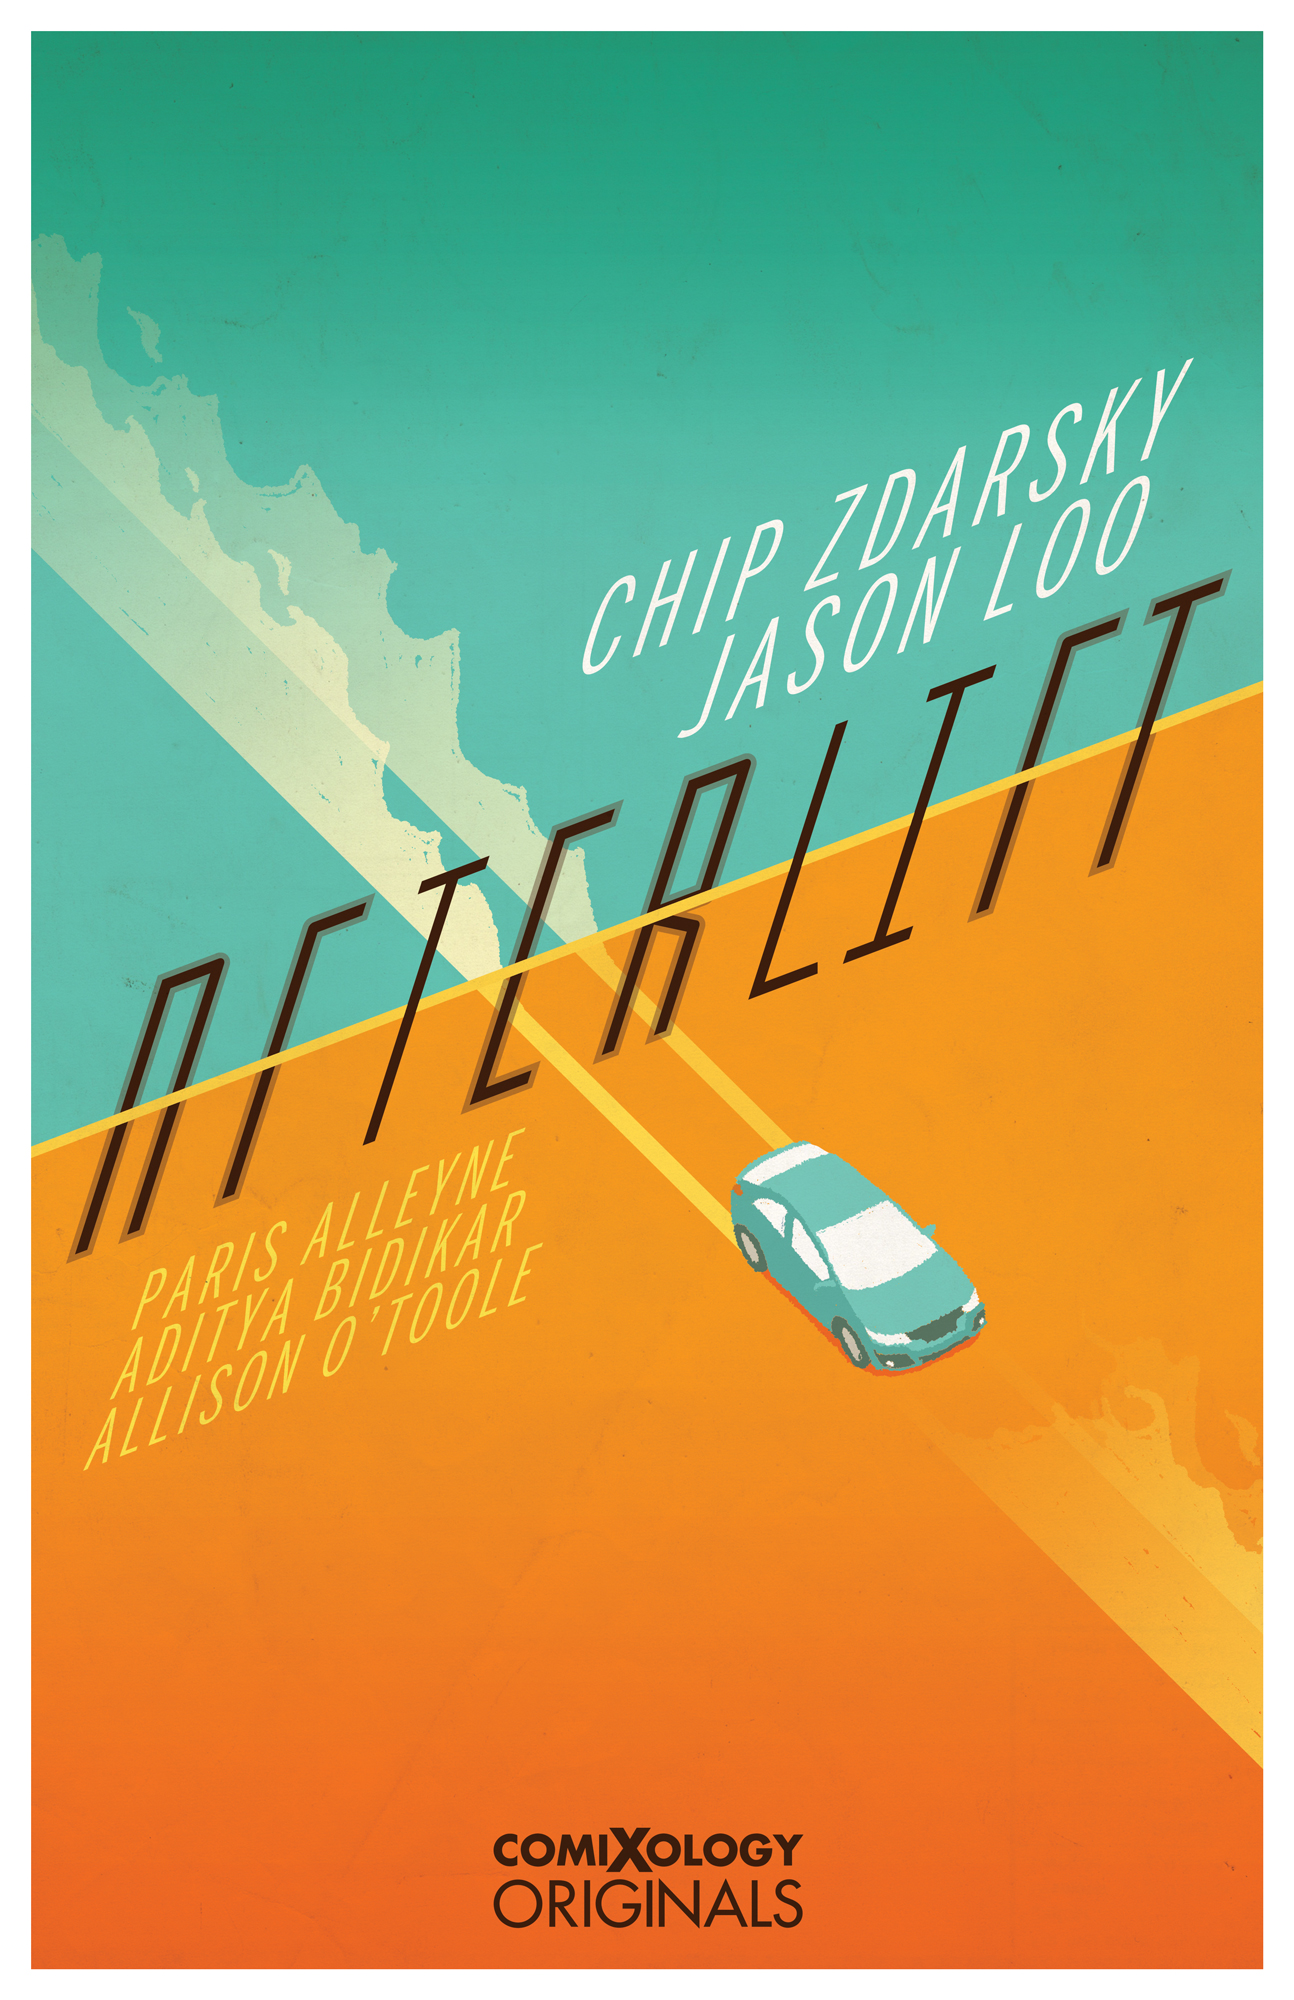 Afterlift SDCC poster by Chip Zdarsky